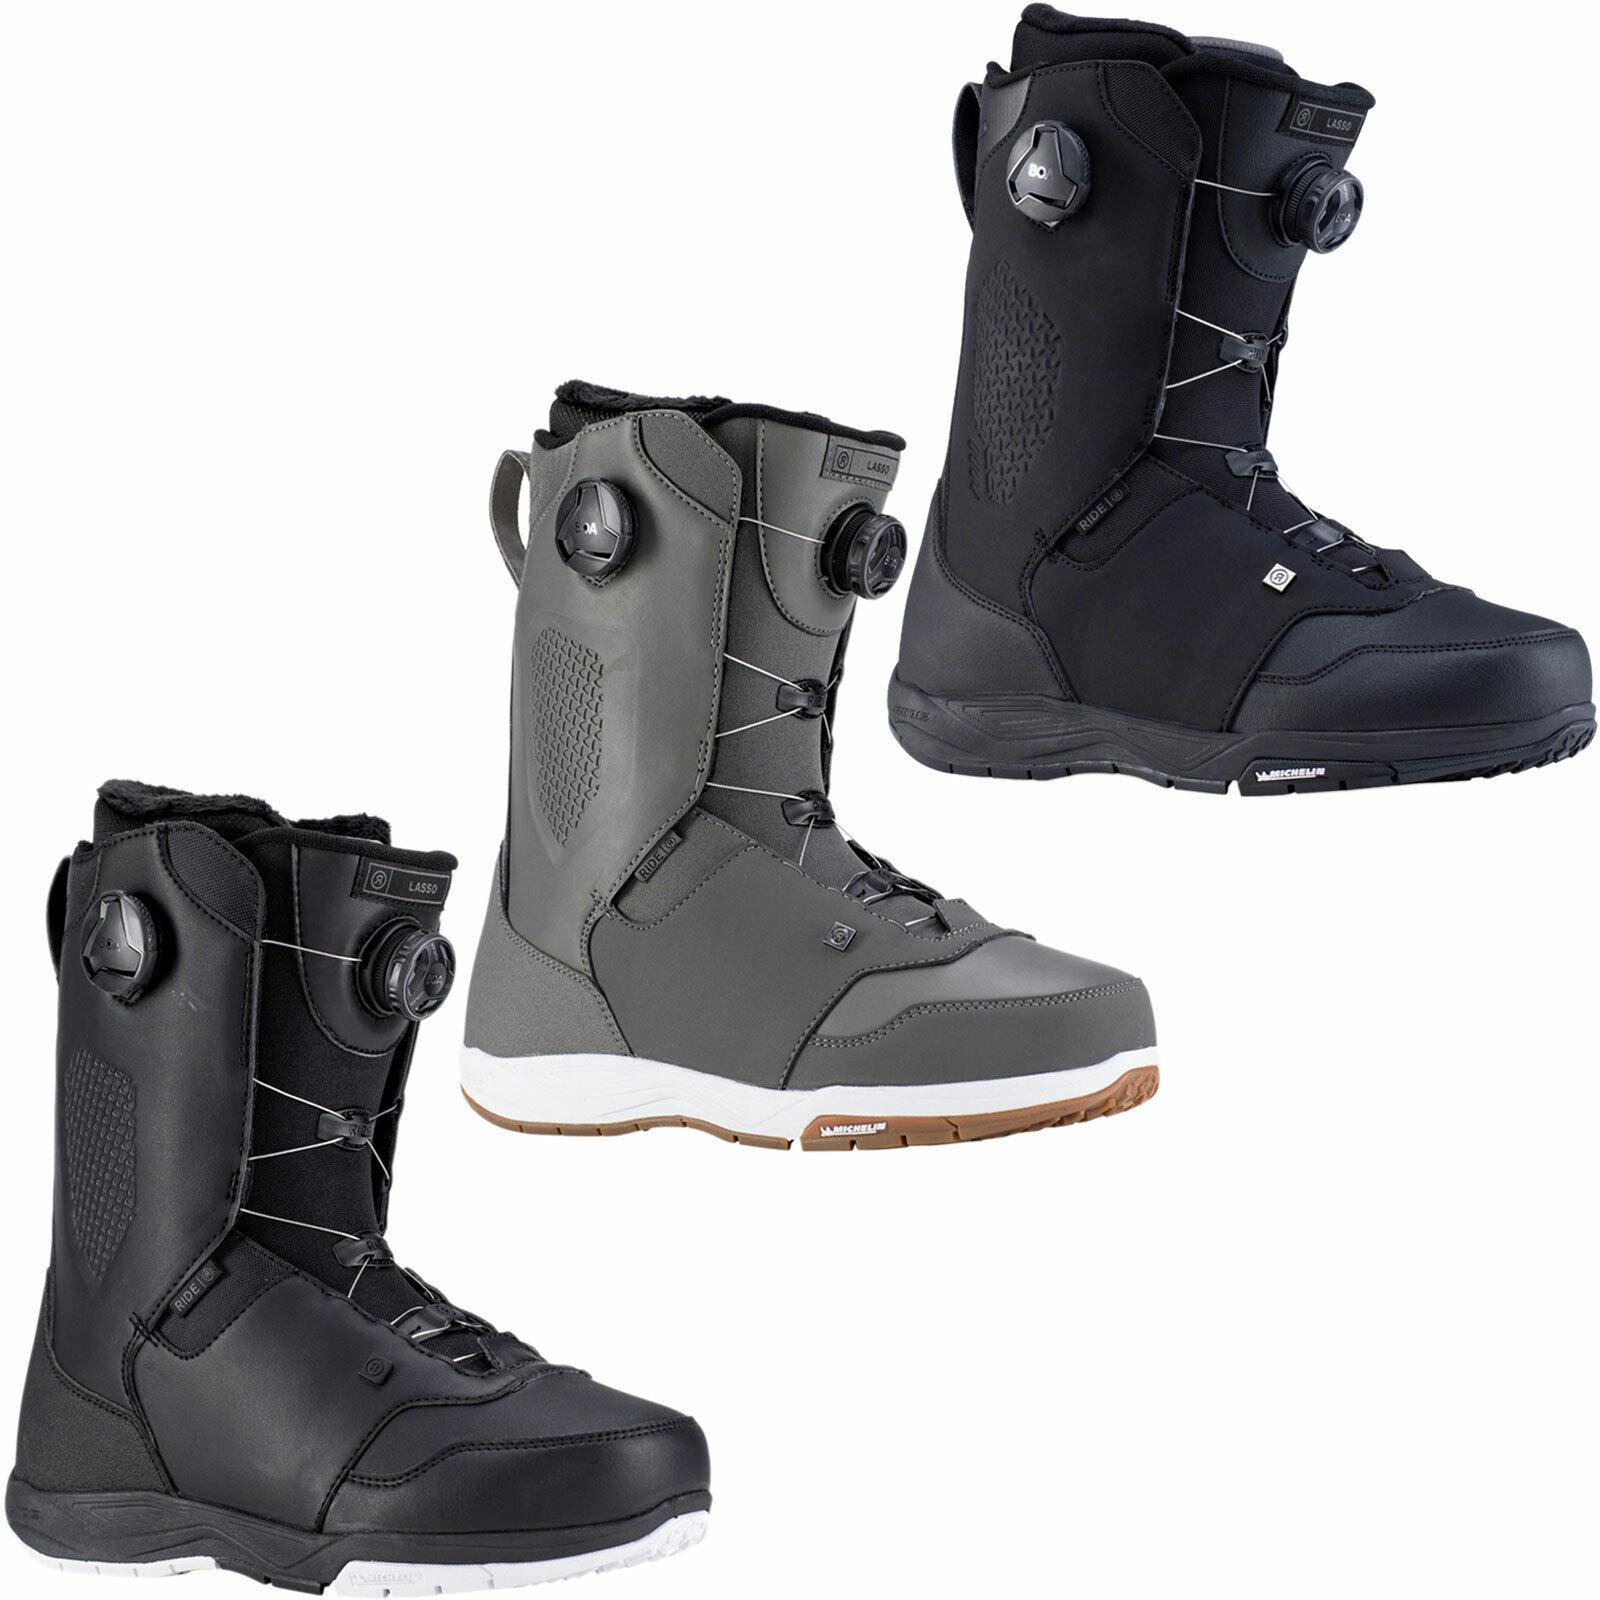 Ride Lasso BOA Herren SnowboardStiefel Snowboard Stiefel Schuhe 2019-2020 NEU